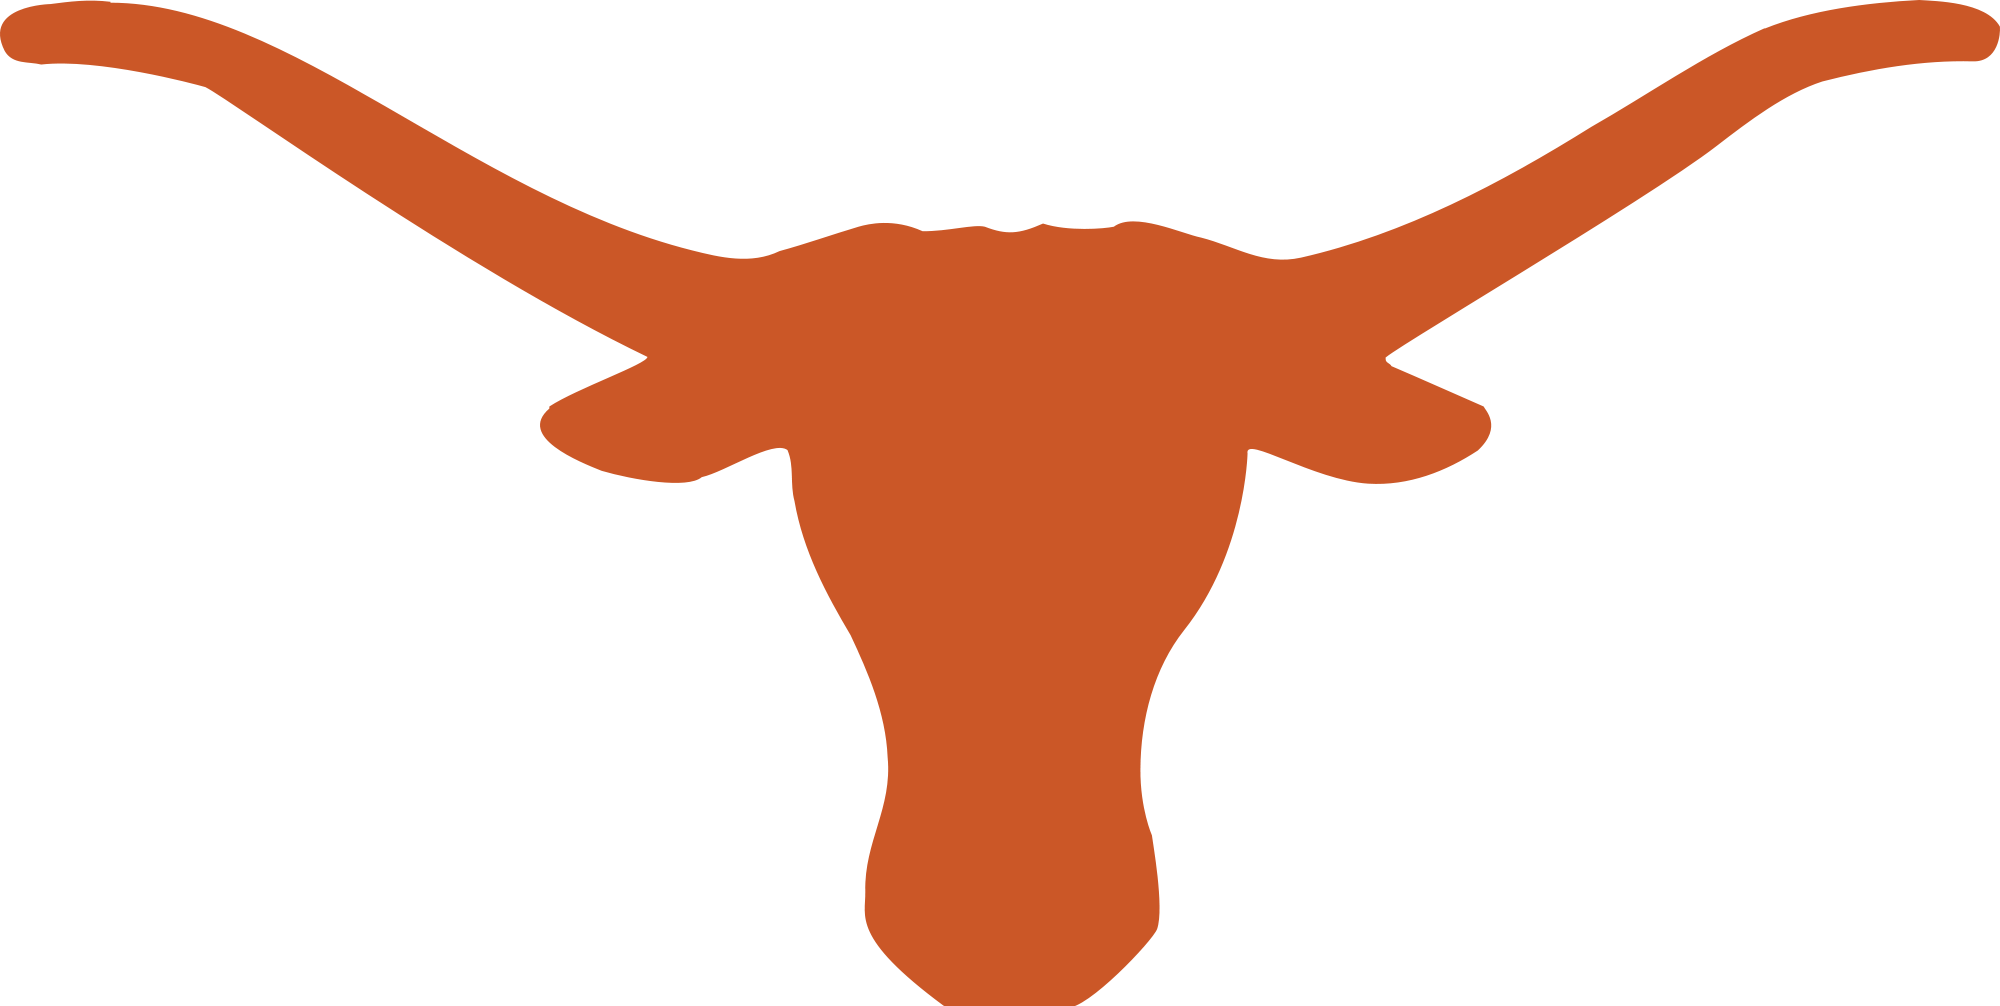 2000x1006 University Of Texas Clipart